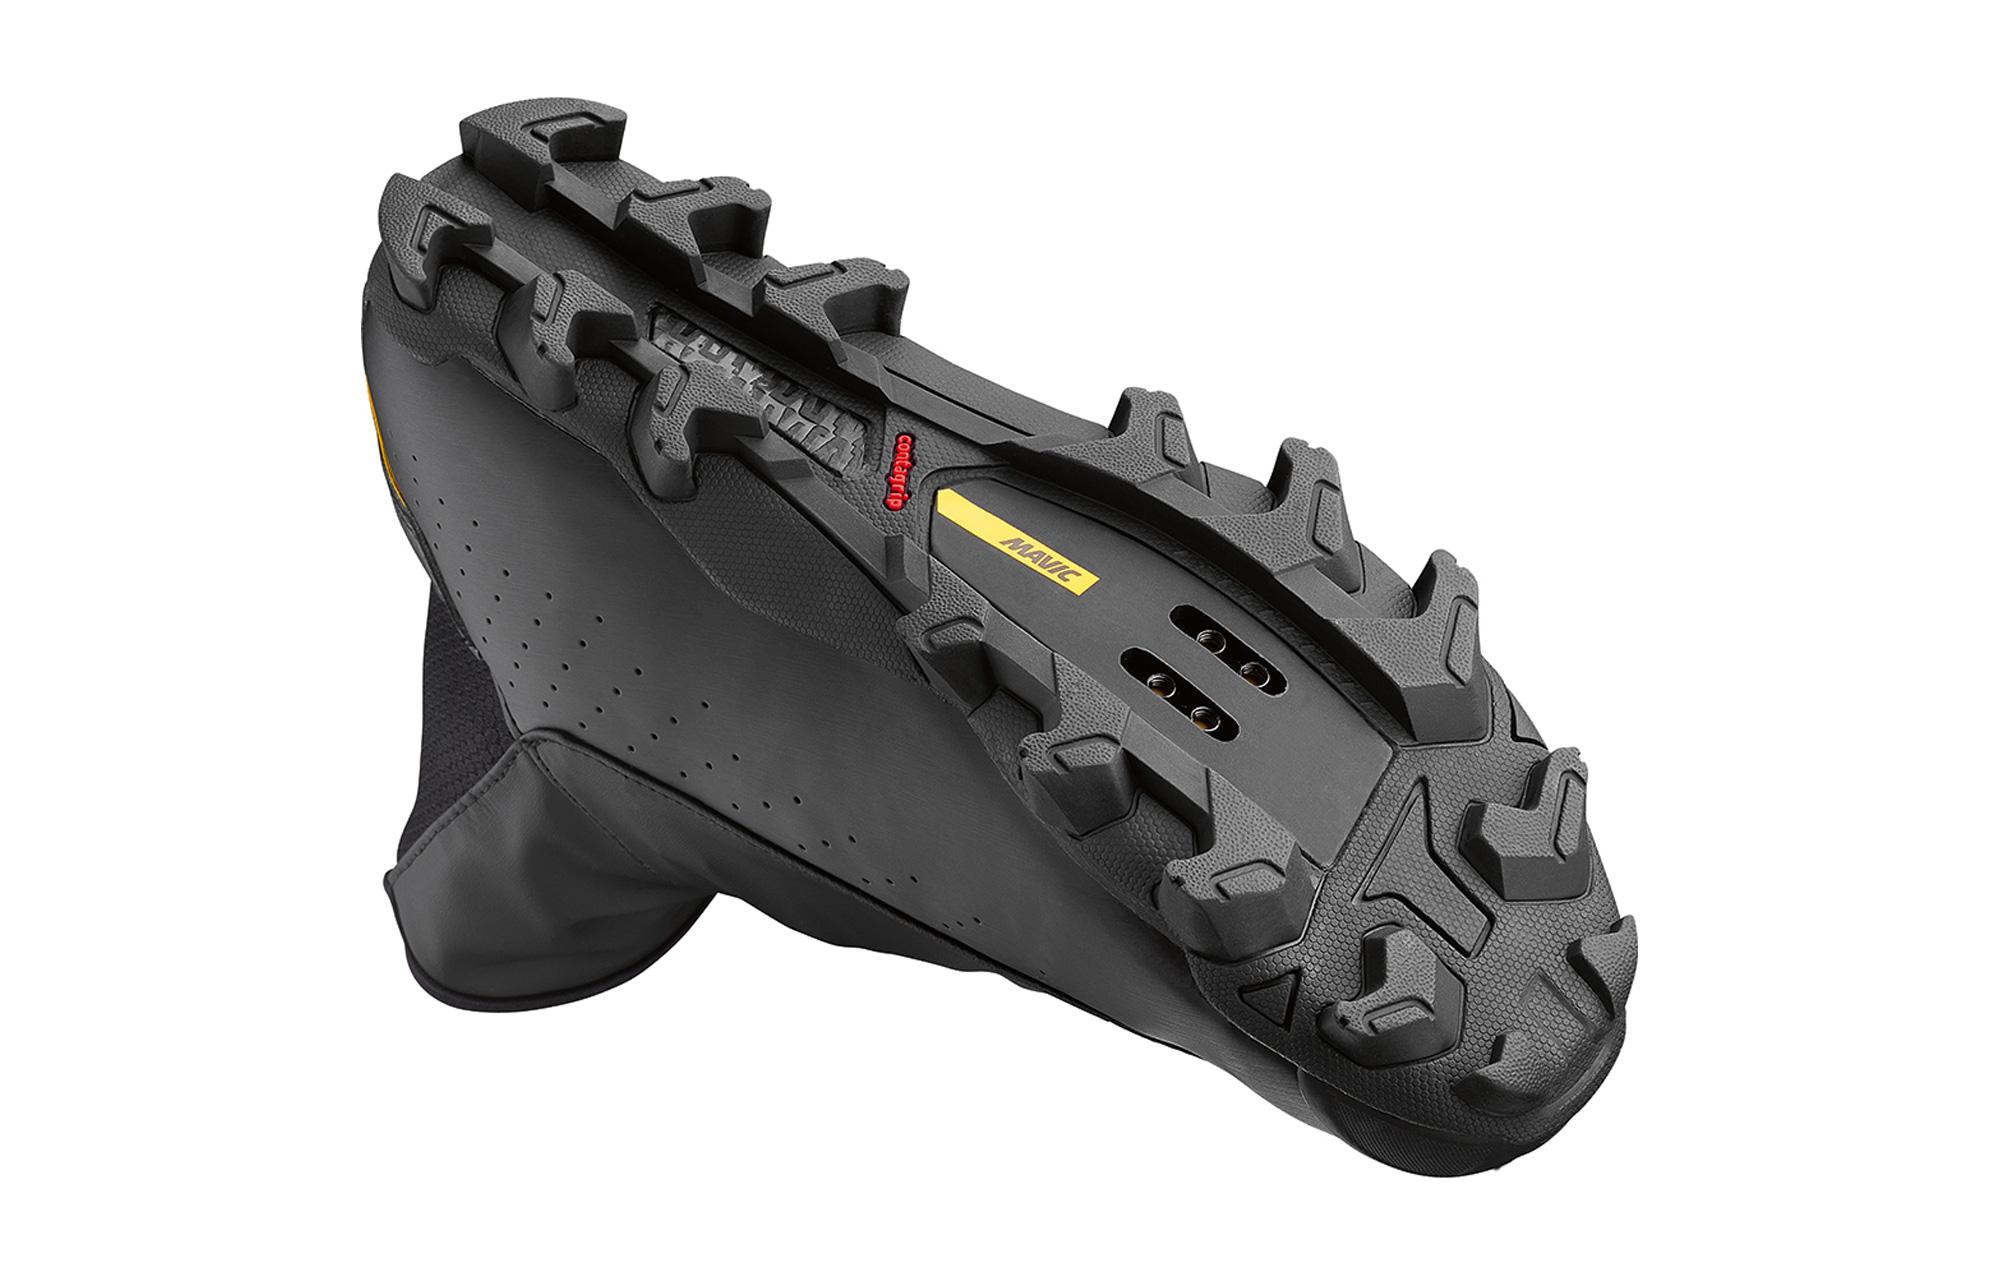 Pro Vtt Crossmax Thermo Mavic Noir Chaussures Sl j3qRL54A